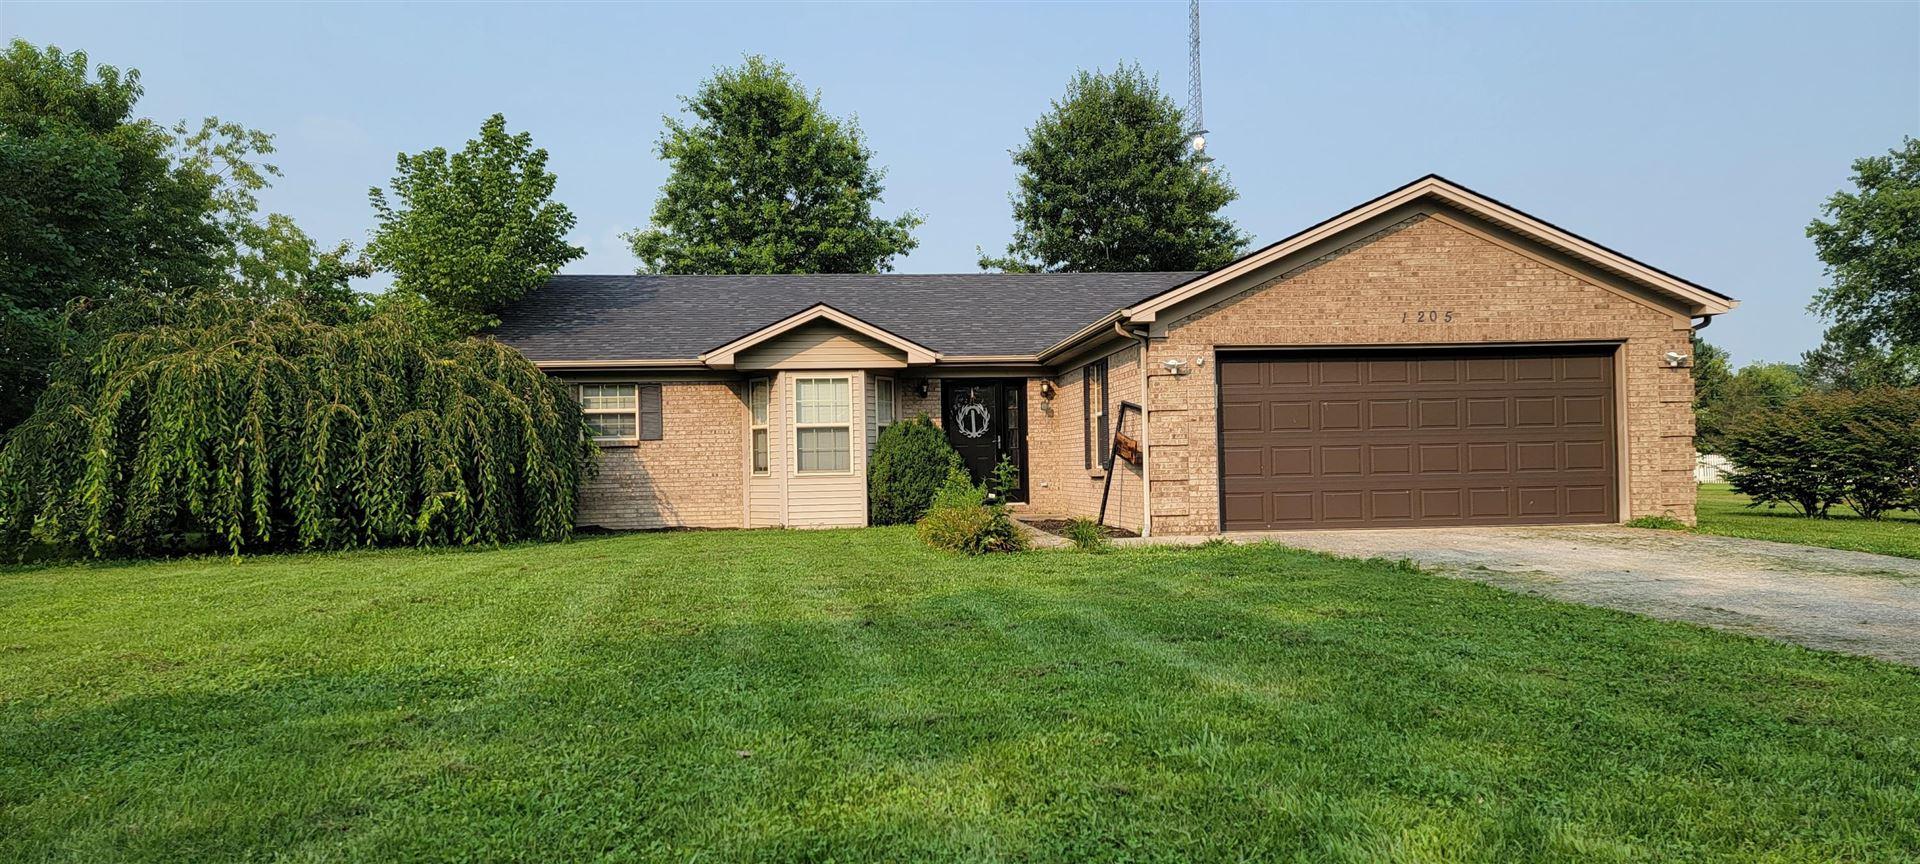 1205 Moberly, Richmond, KY 40475 - MLS#: 20114170